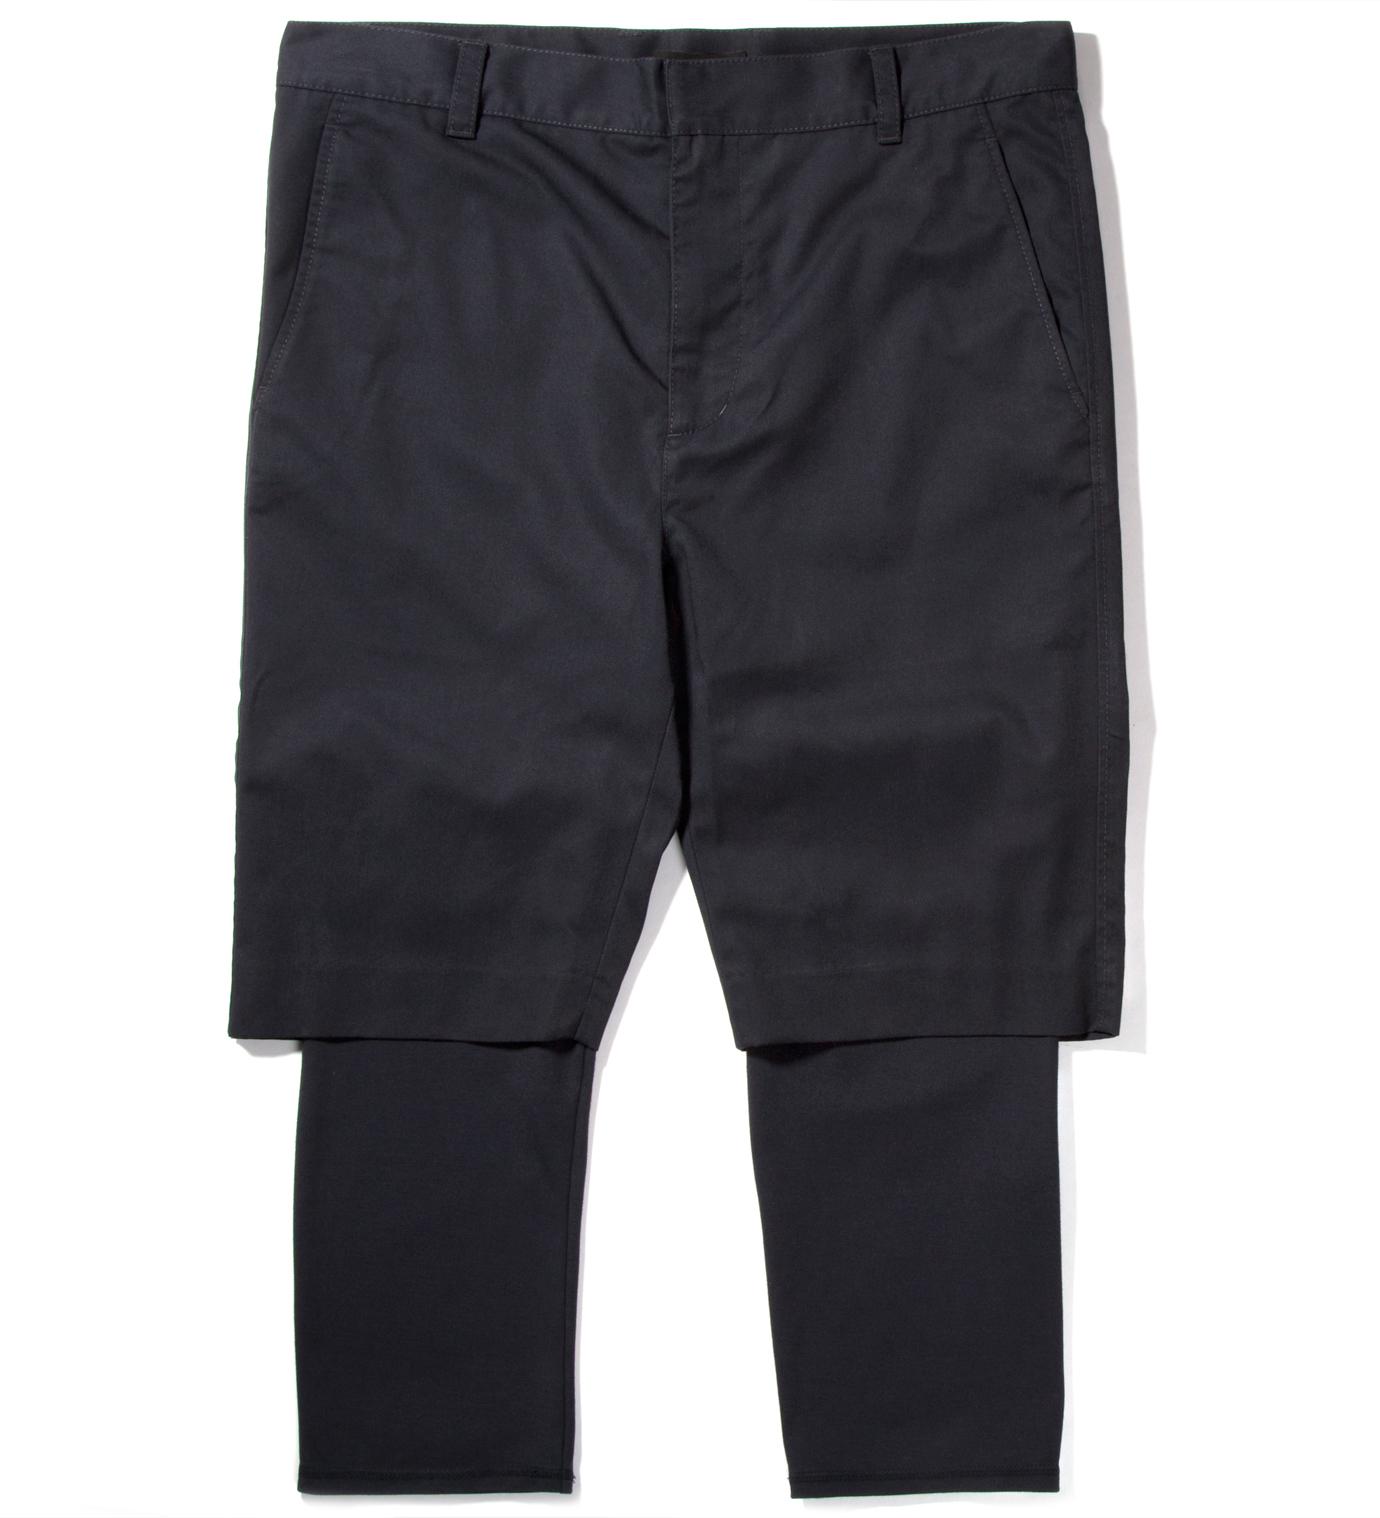 3.1 Phillip Lim Midnight Slim Fit Short with Knit Cuff